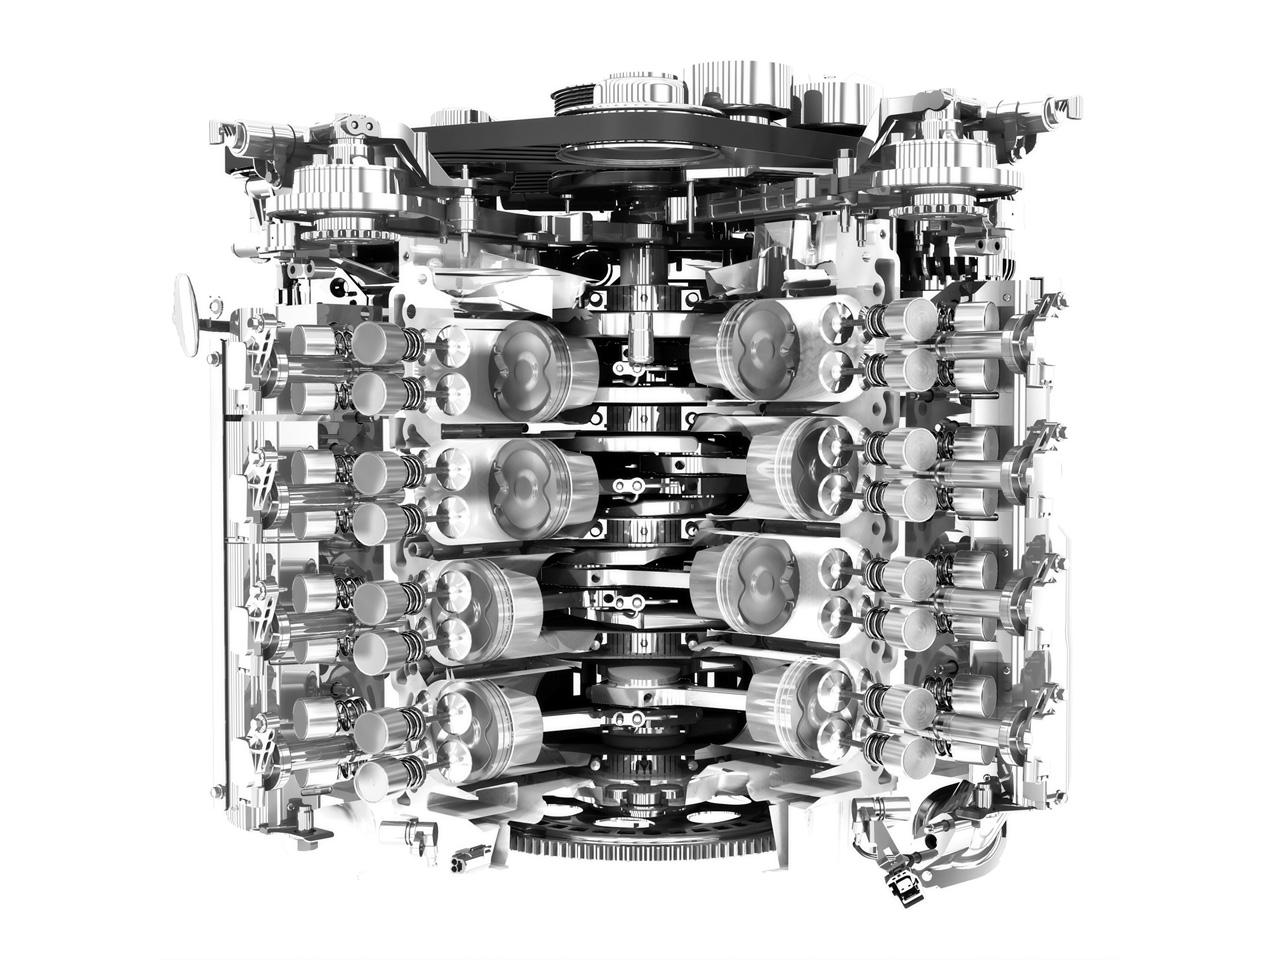 Sensational Jaguar Engine Diagram Cutaway Online Wiring Diagram Wiring Cloud Lukepaidewilluminateatxorg